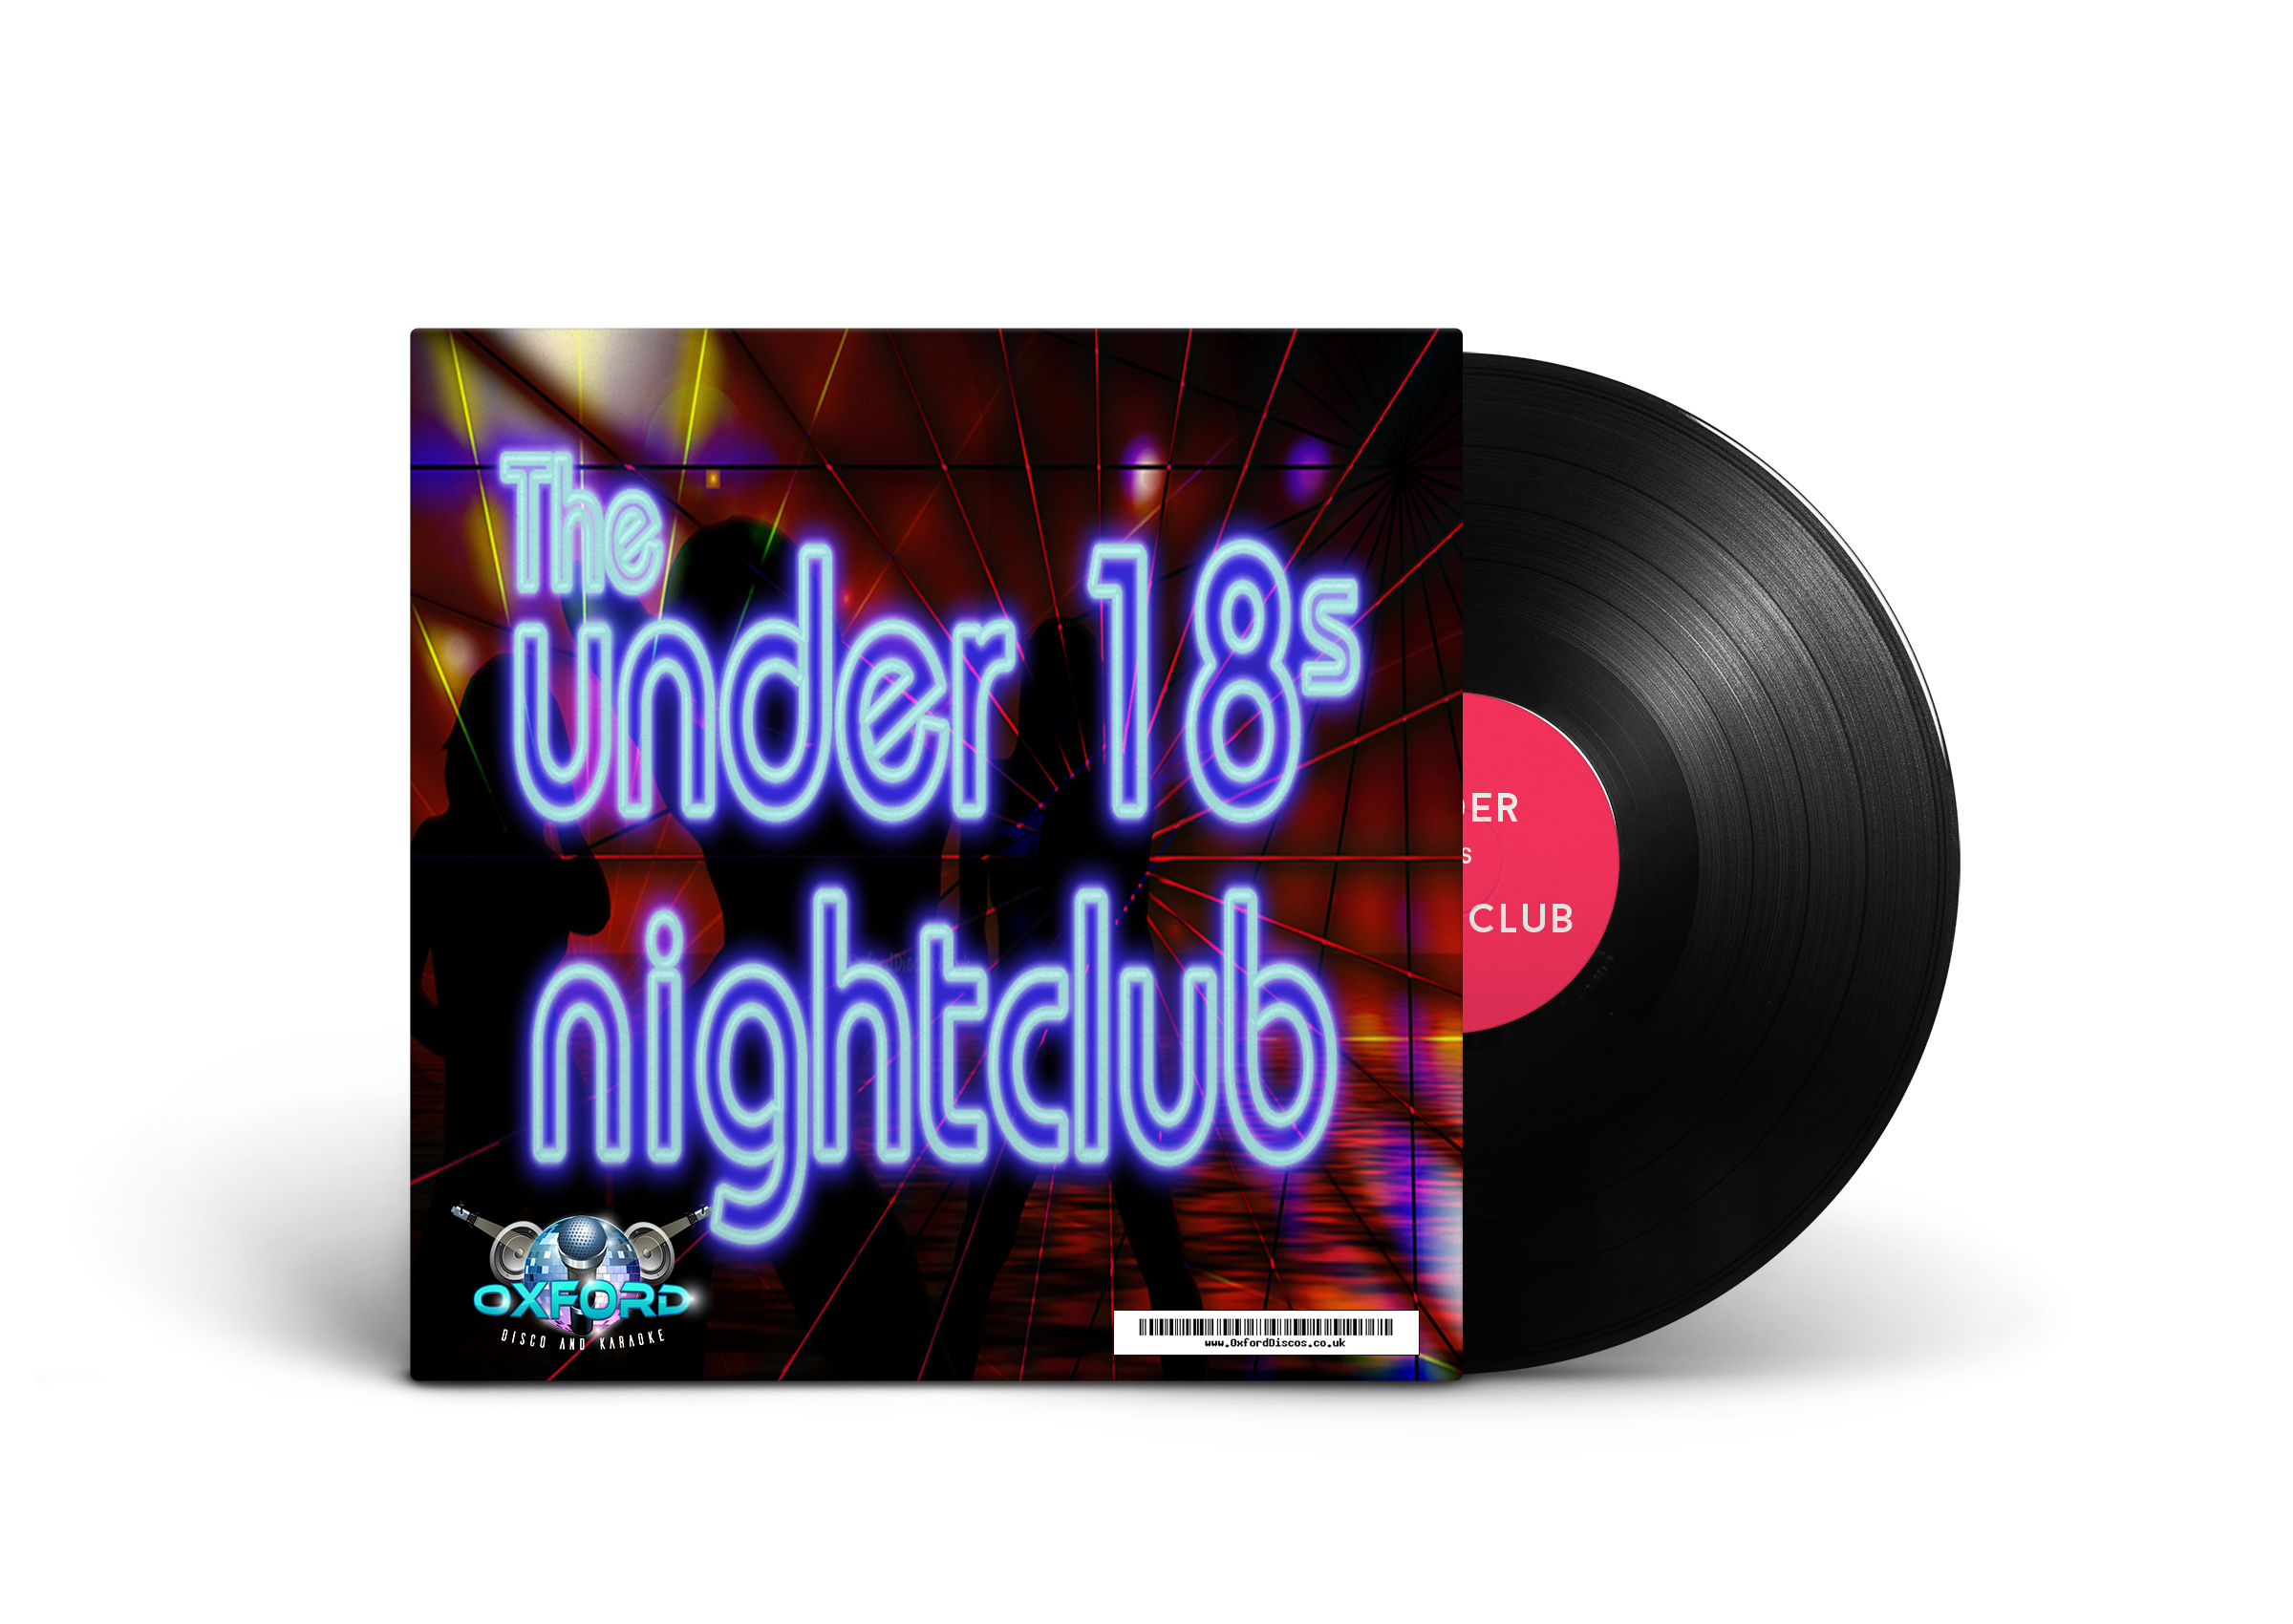 27 Under 18s Night Club